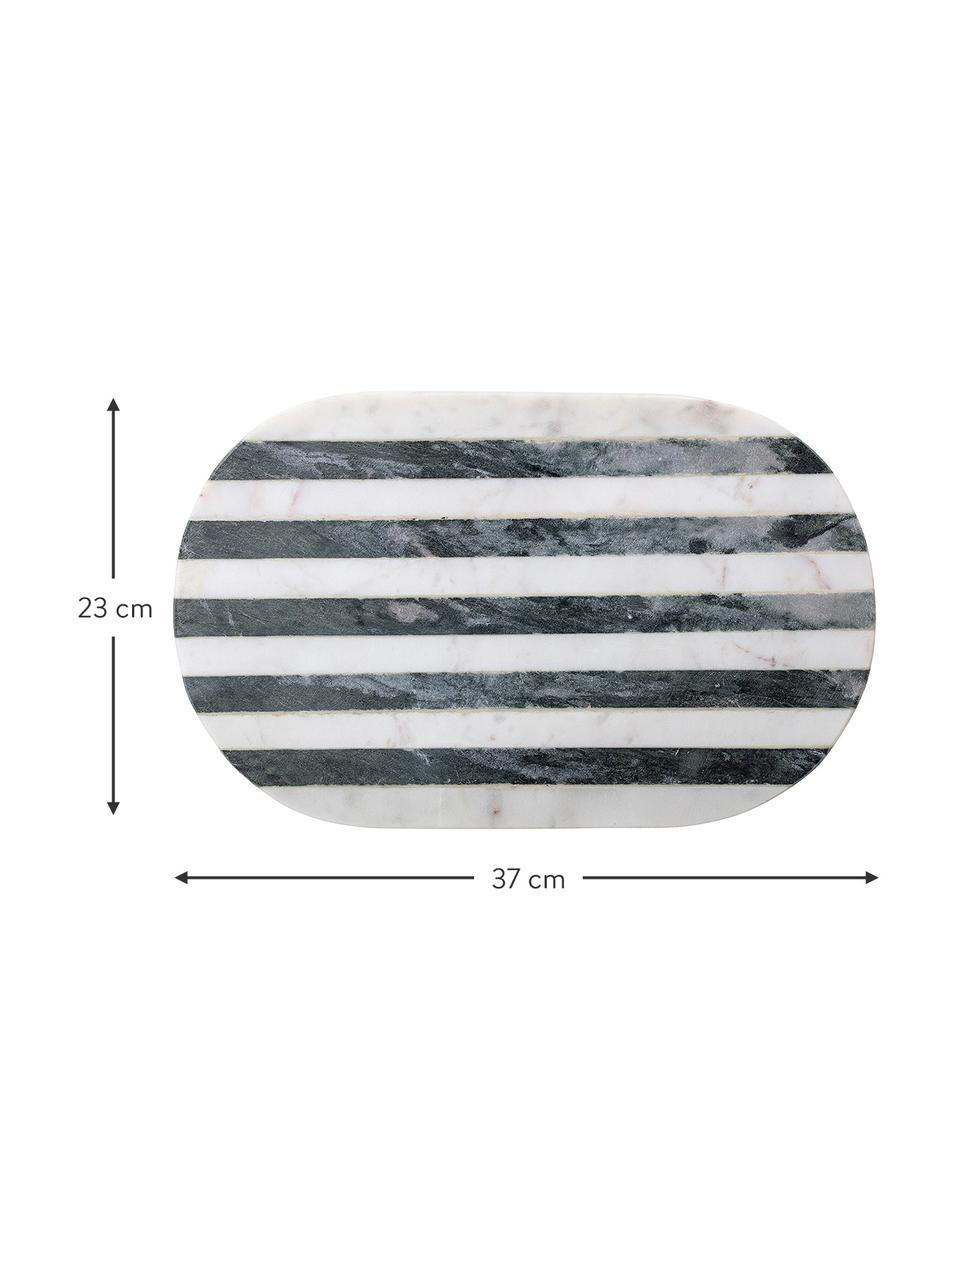 Tagliere in marmo Stripes, 37x23 cm, Marmo, Nero, bianco, Lung. 37 x Larg. 23 cm